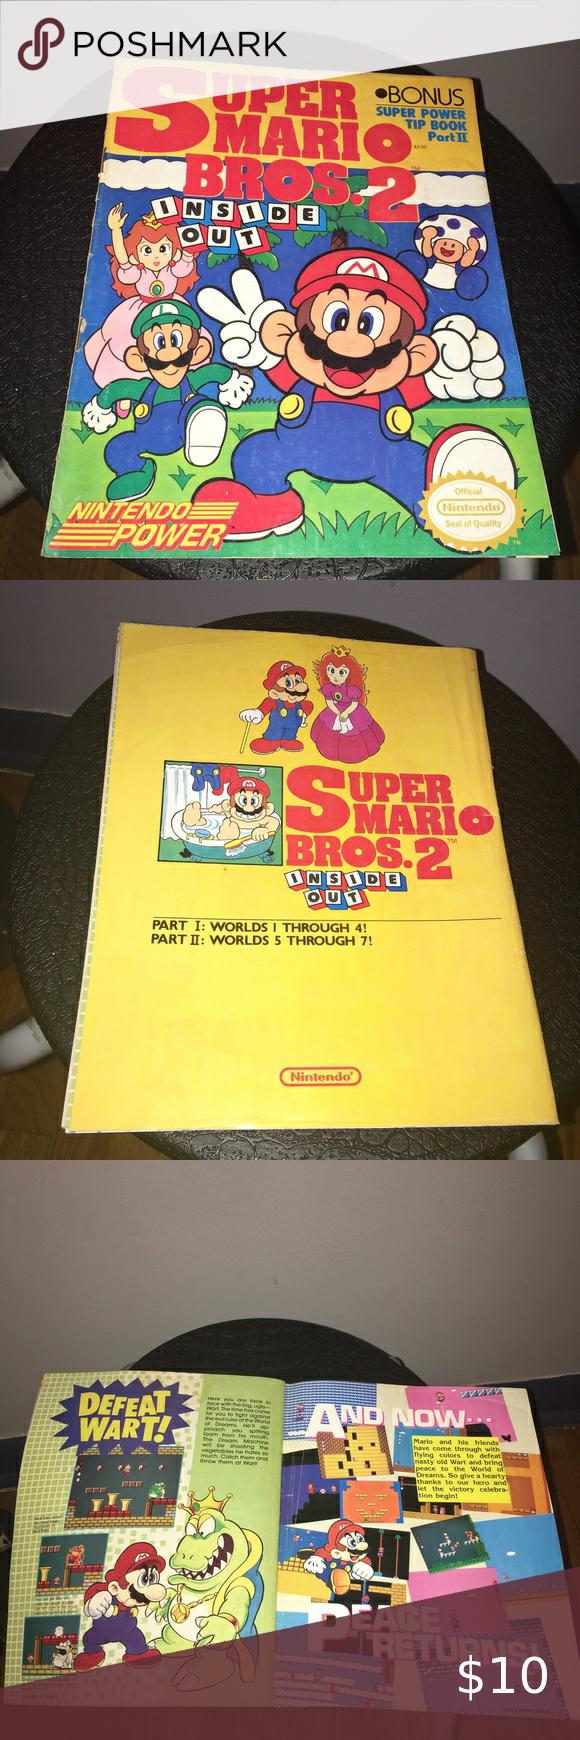 Super Mario Bro S 2 Magazine In 2020 Super Mario Mario Super Mario Bros